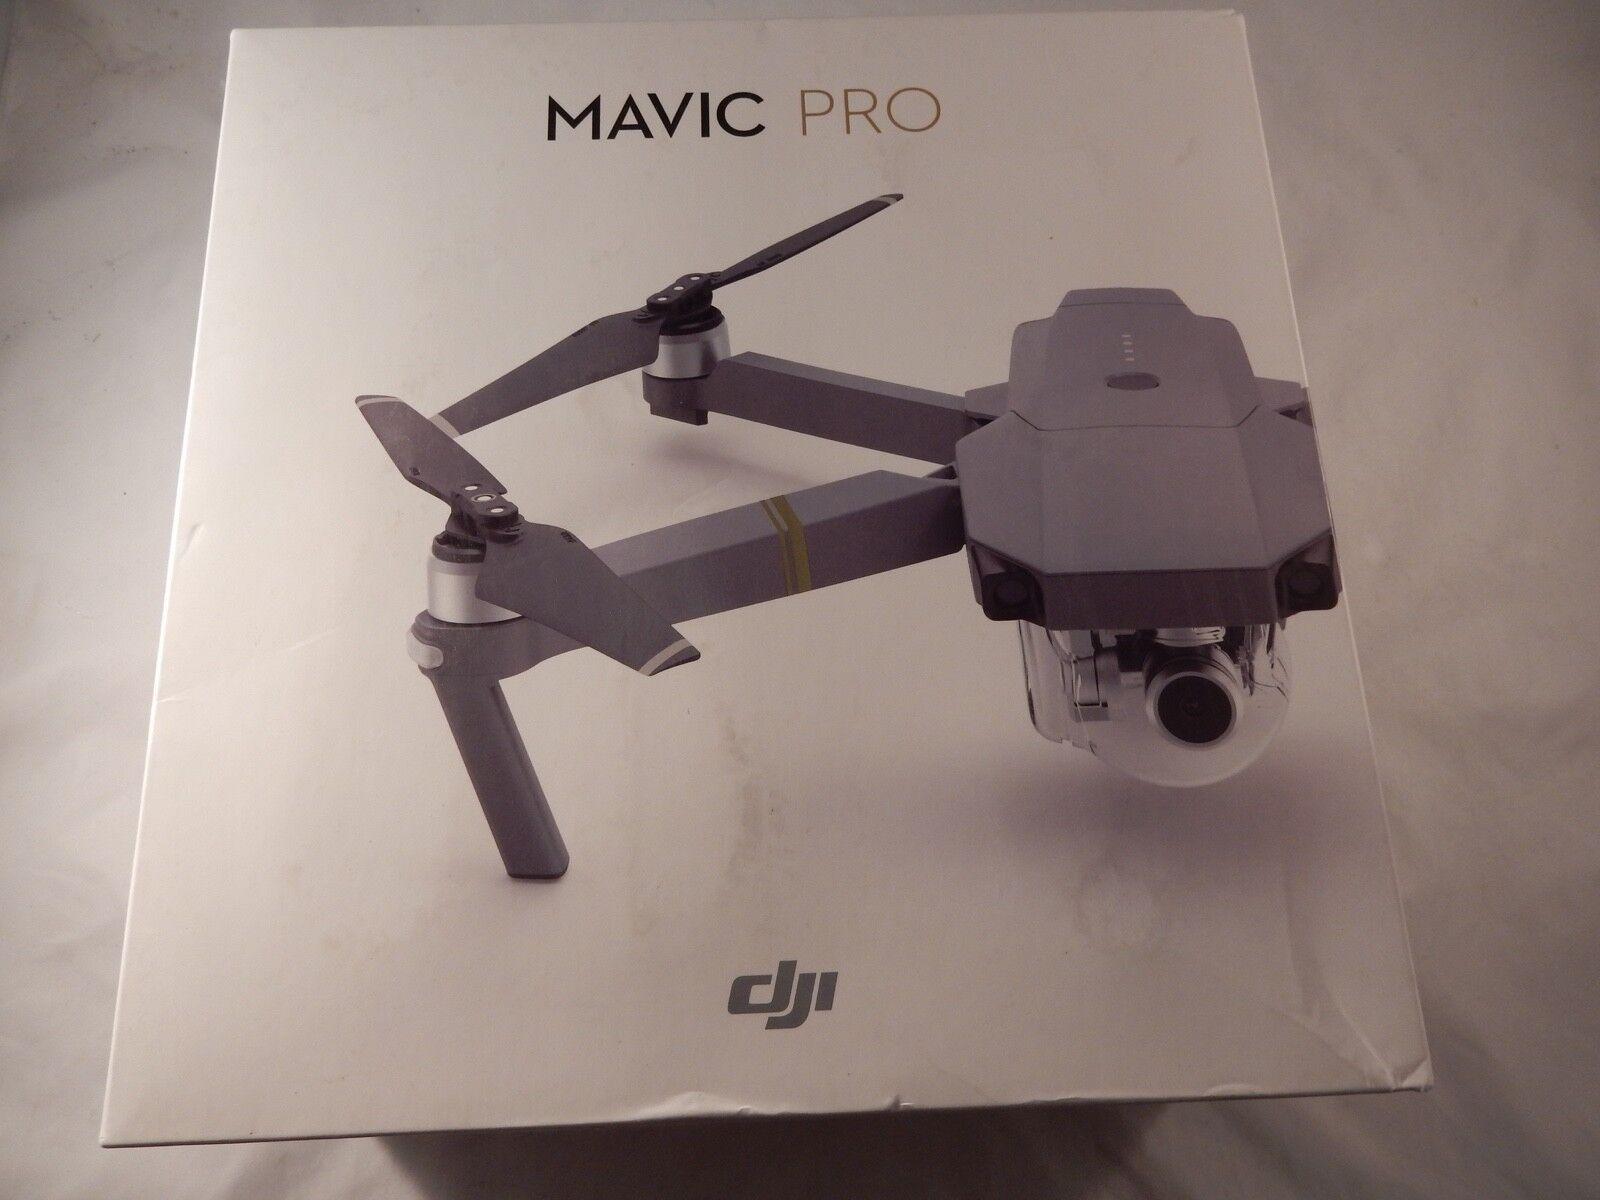 DJI Mavic Pro Quadcopter Drone 4K Stabilized Camera Grey + REMOTE (NEW) S703